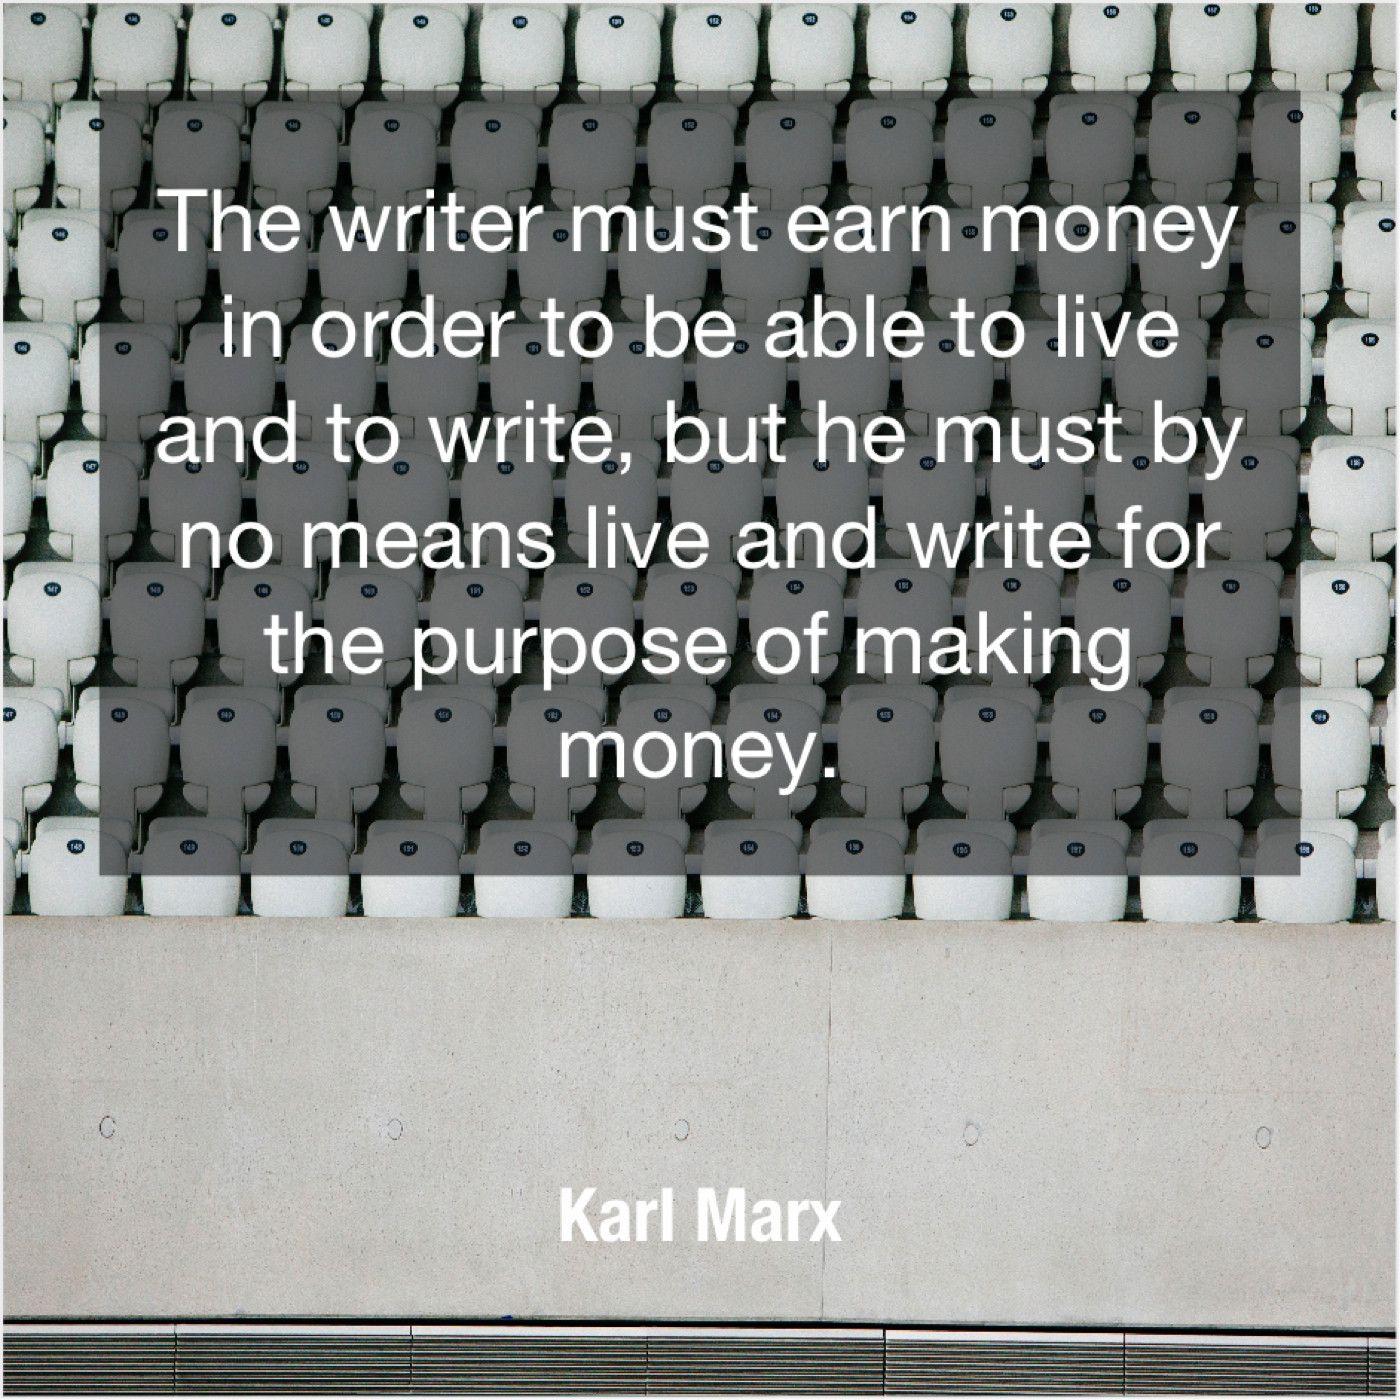 Karl Marx The Writer Must Earn Money Leona Lewis Karl Marx William Hague